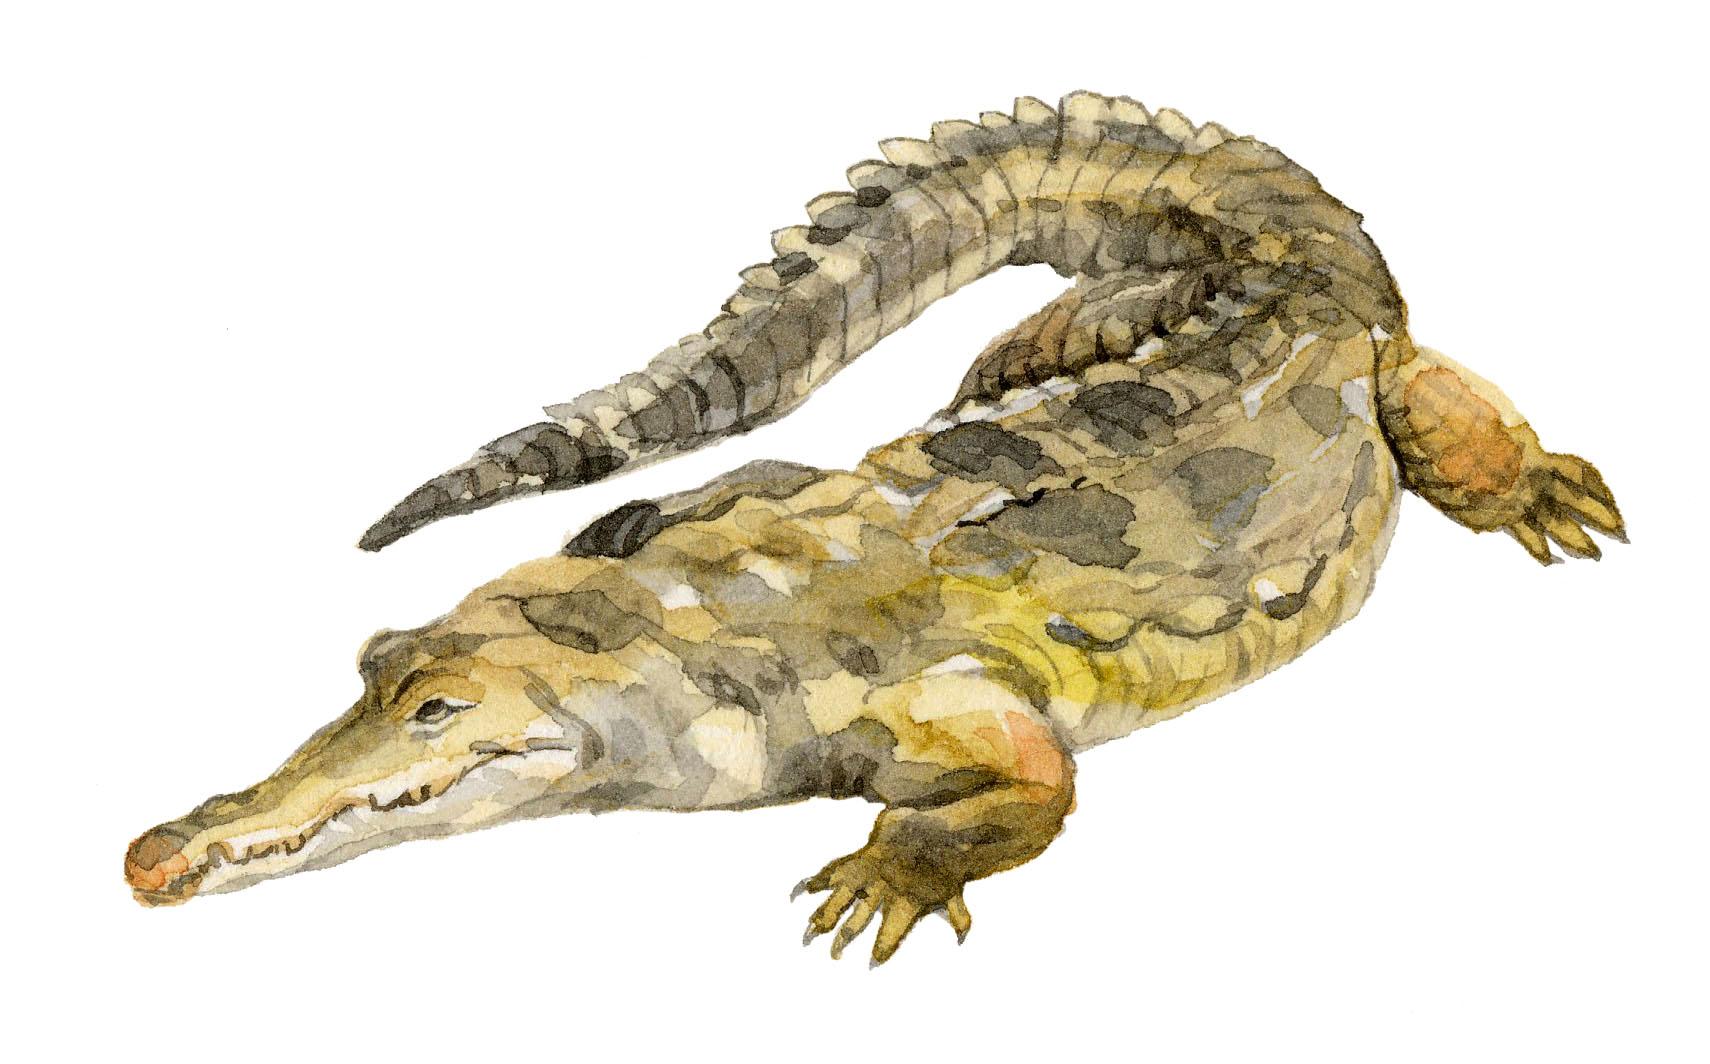 orinoco-crocodile-lrg.jpg